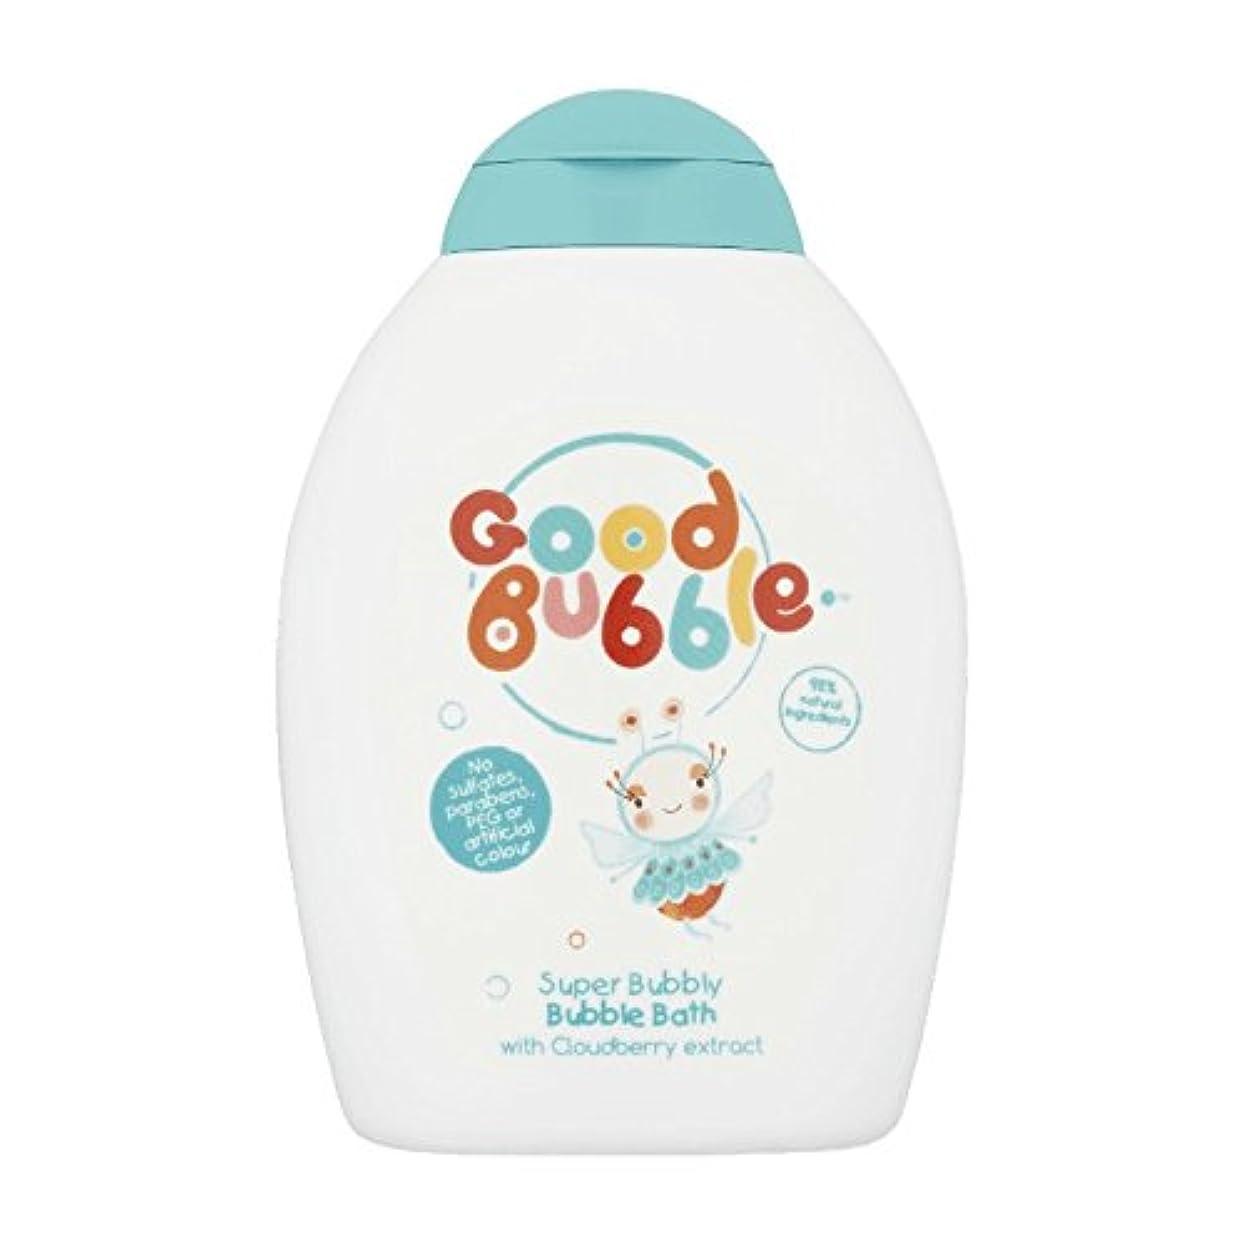 Good Bubble Cloudberry Bubble Bath 400ml (Pack of 2) - 良いバブルクラウドベリーバブルバス400ミリリットル (x2) [並行輸入品]